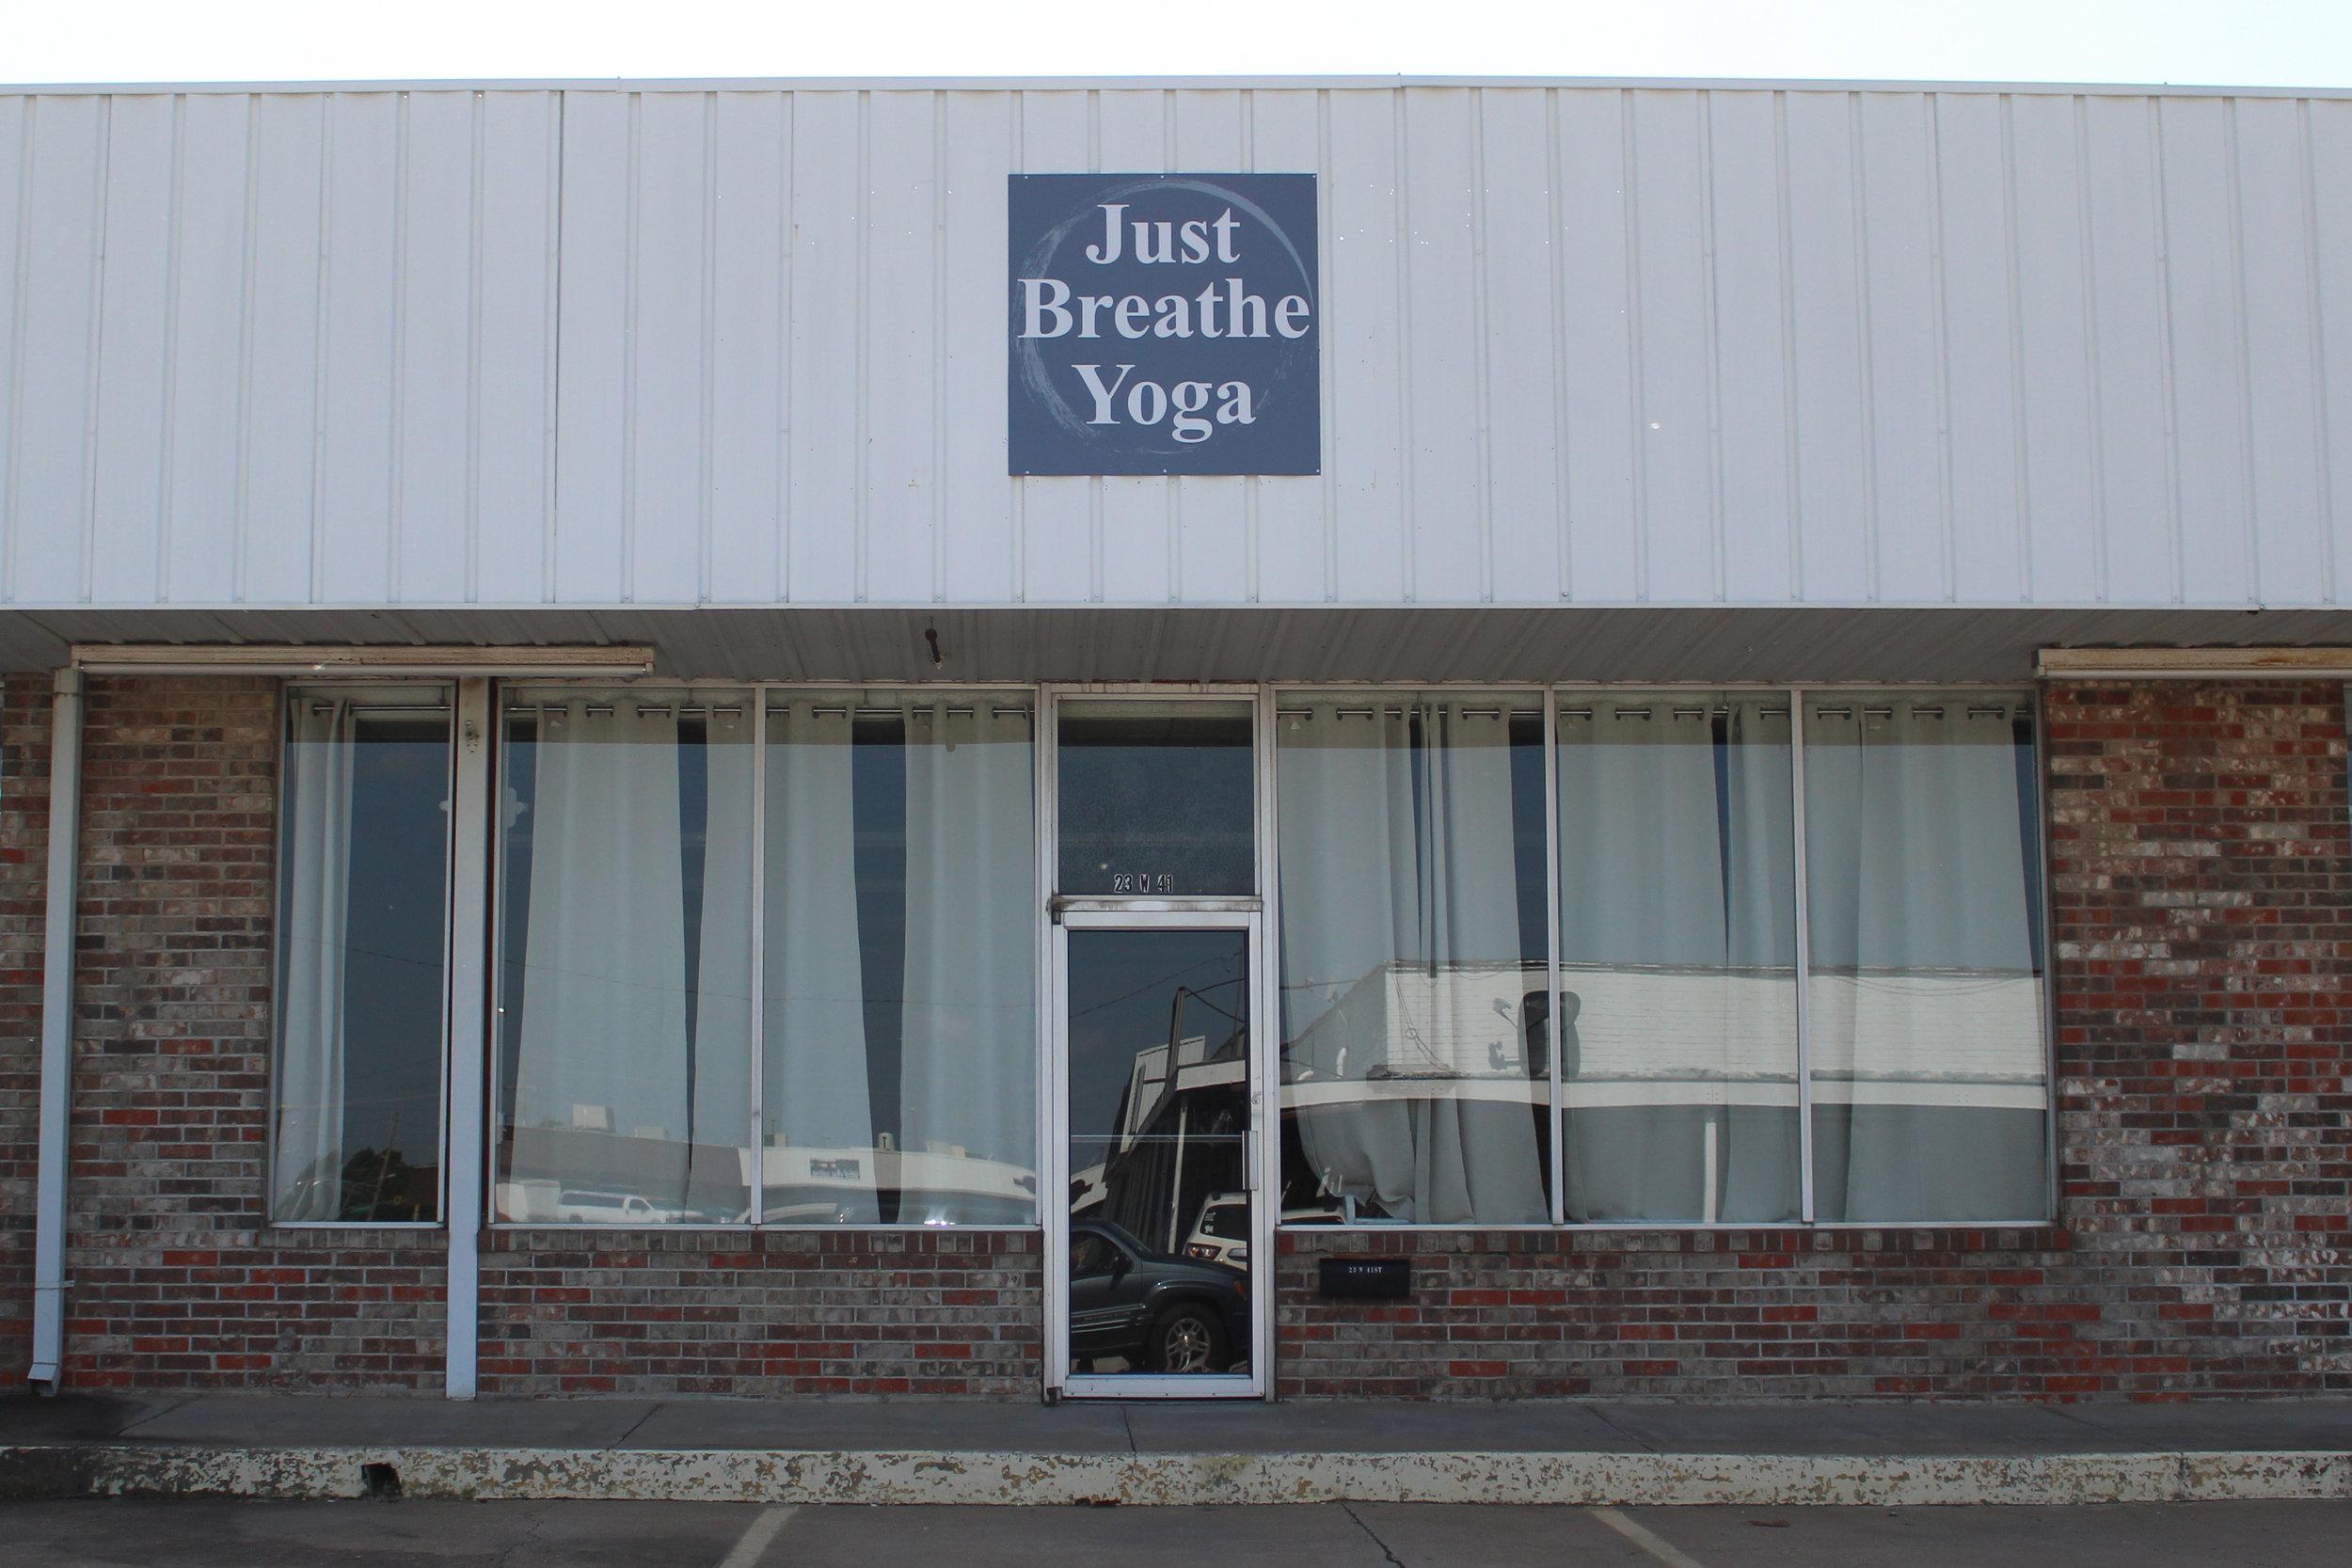 Just Breathe Yoga - Prattville Center 23 West 41st Street